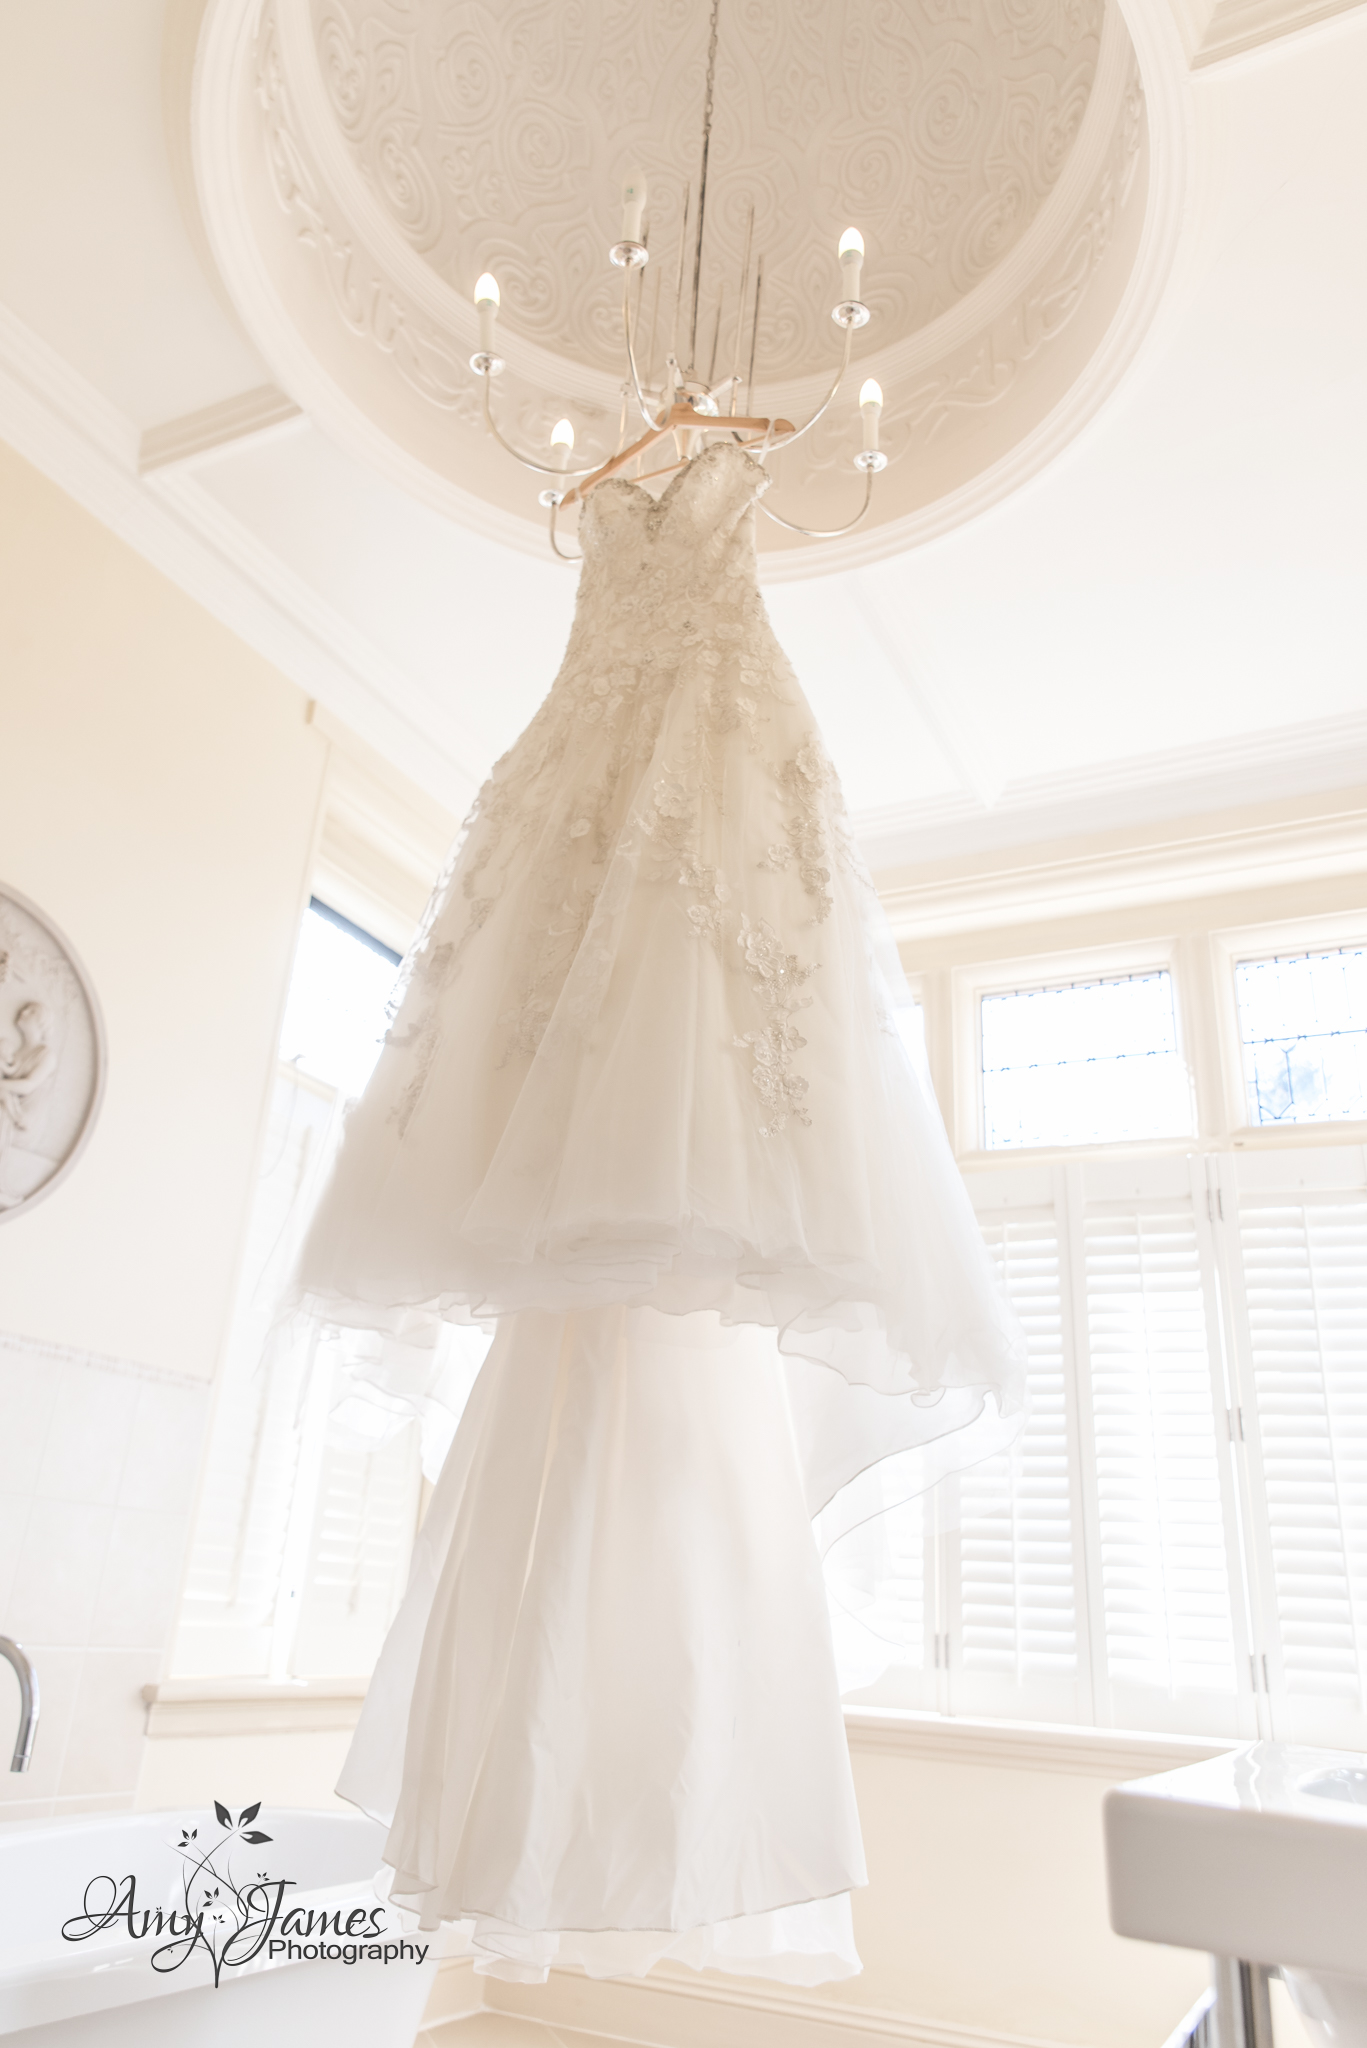 Frimley Hall Hotel Wedding Photographer // Hampshire wedding photographer // Fleet wedding Photographer